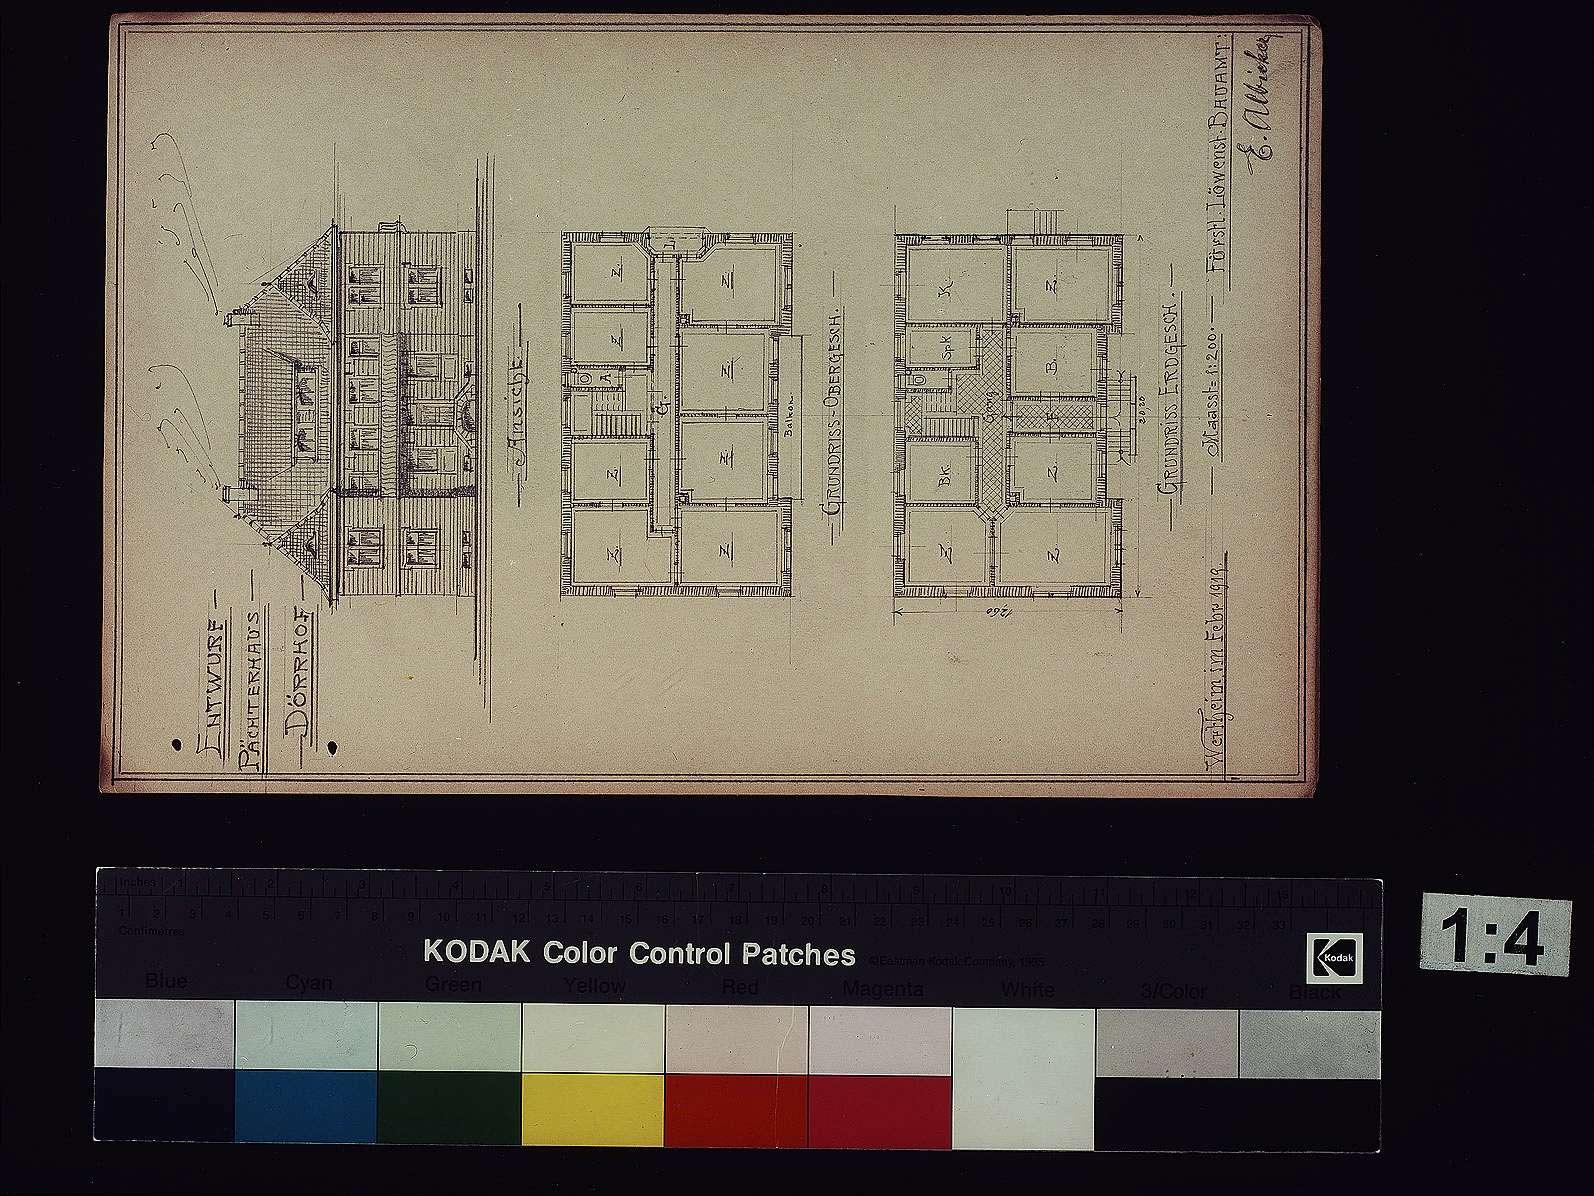 Dörrhof bei Rosenberg: Entwurf zum Pächterhaus, Bild 1